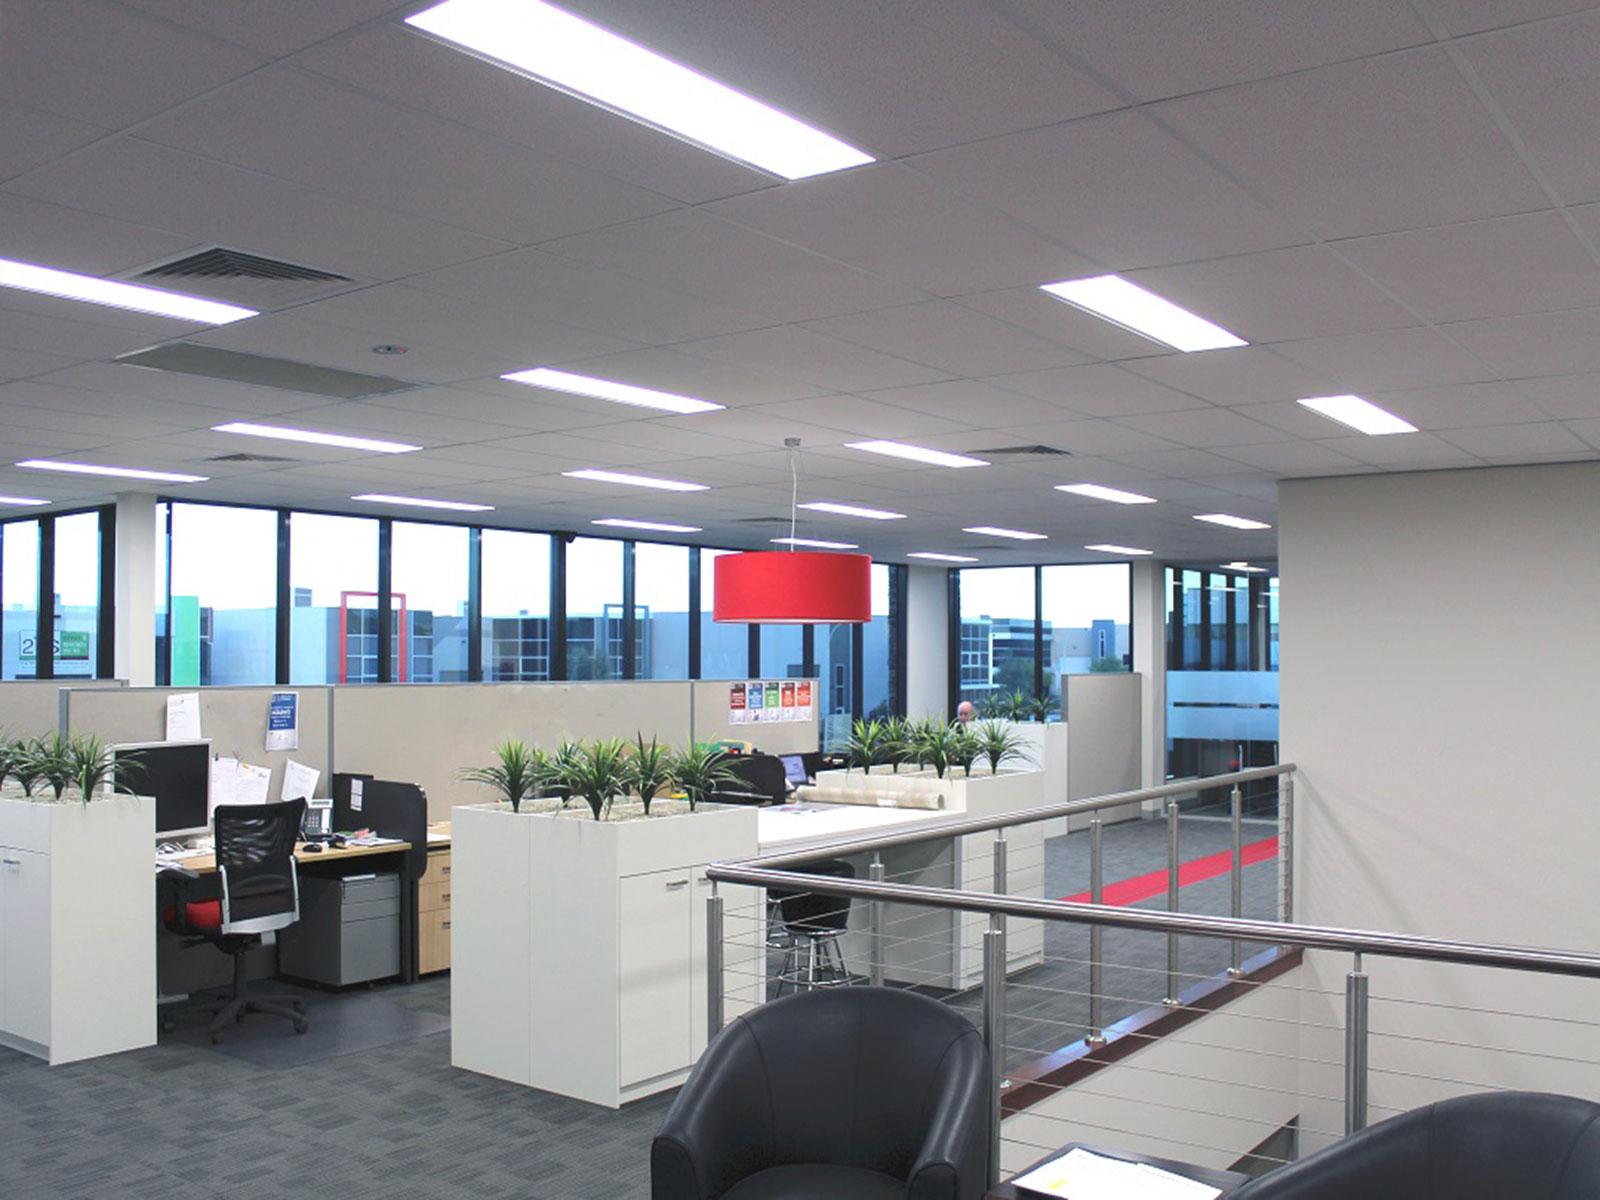 Office Lighting Office Room Lighting Upshine Lighting